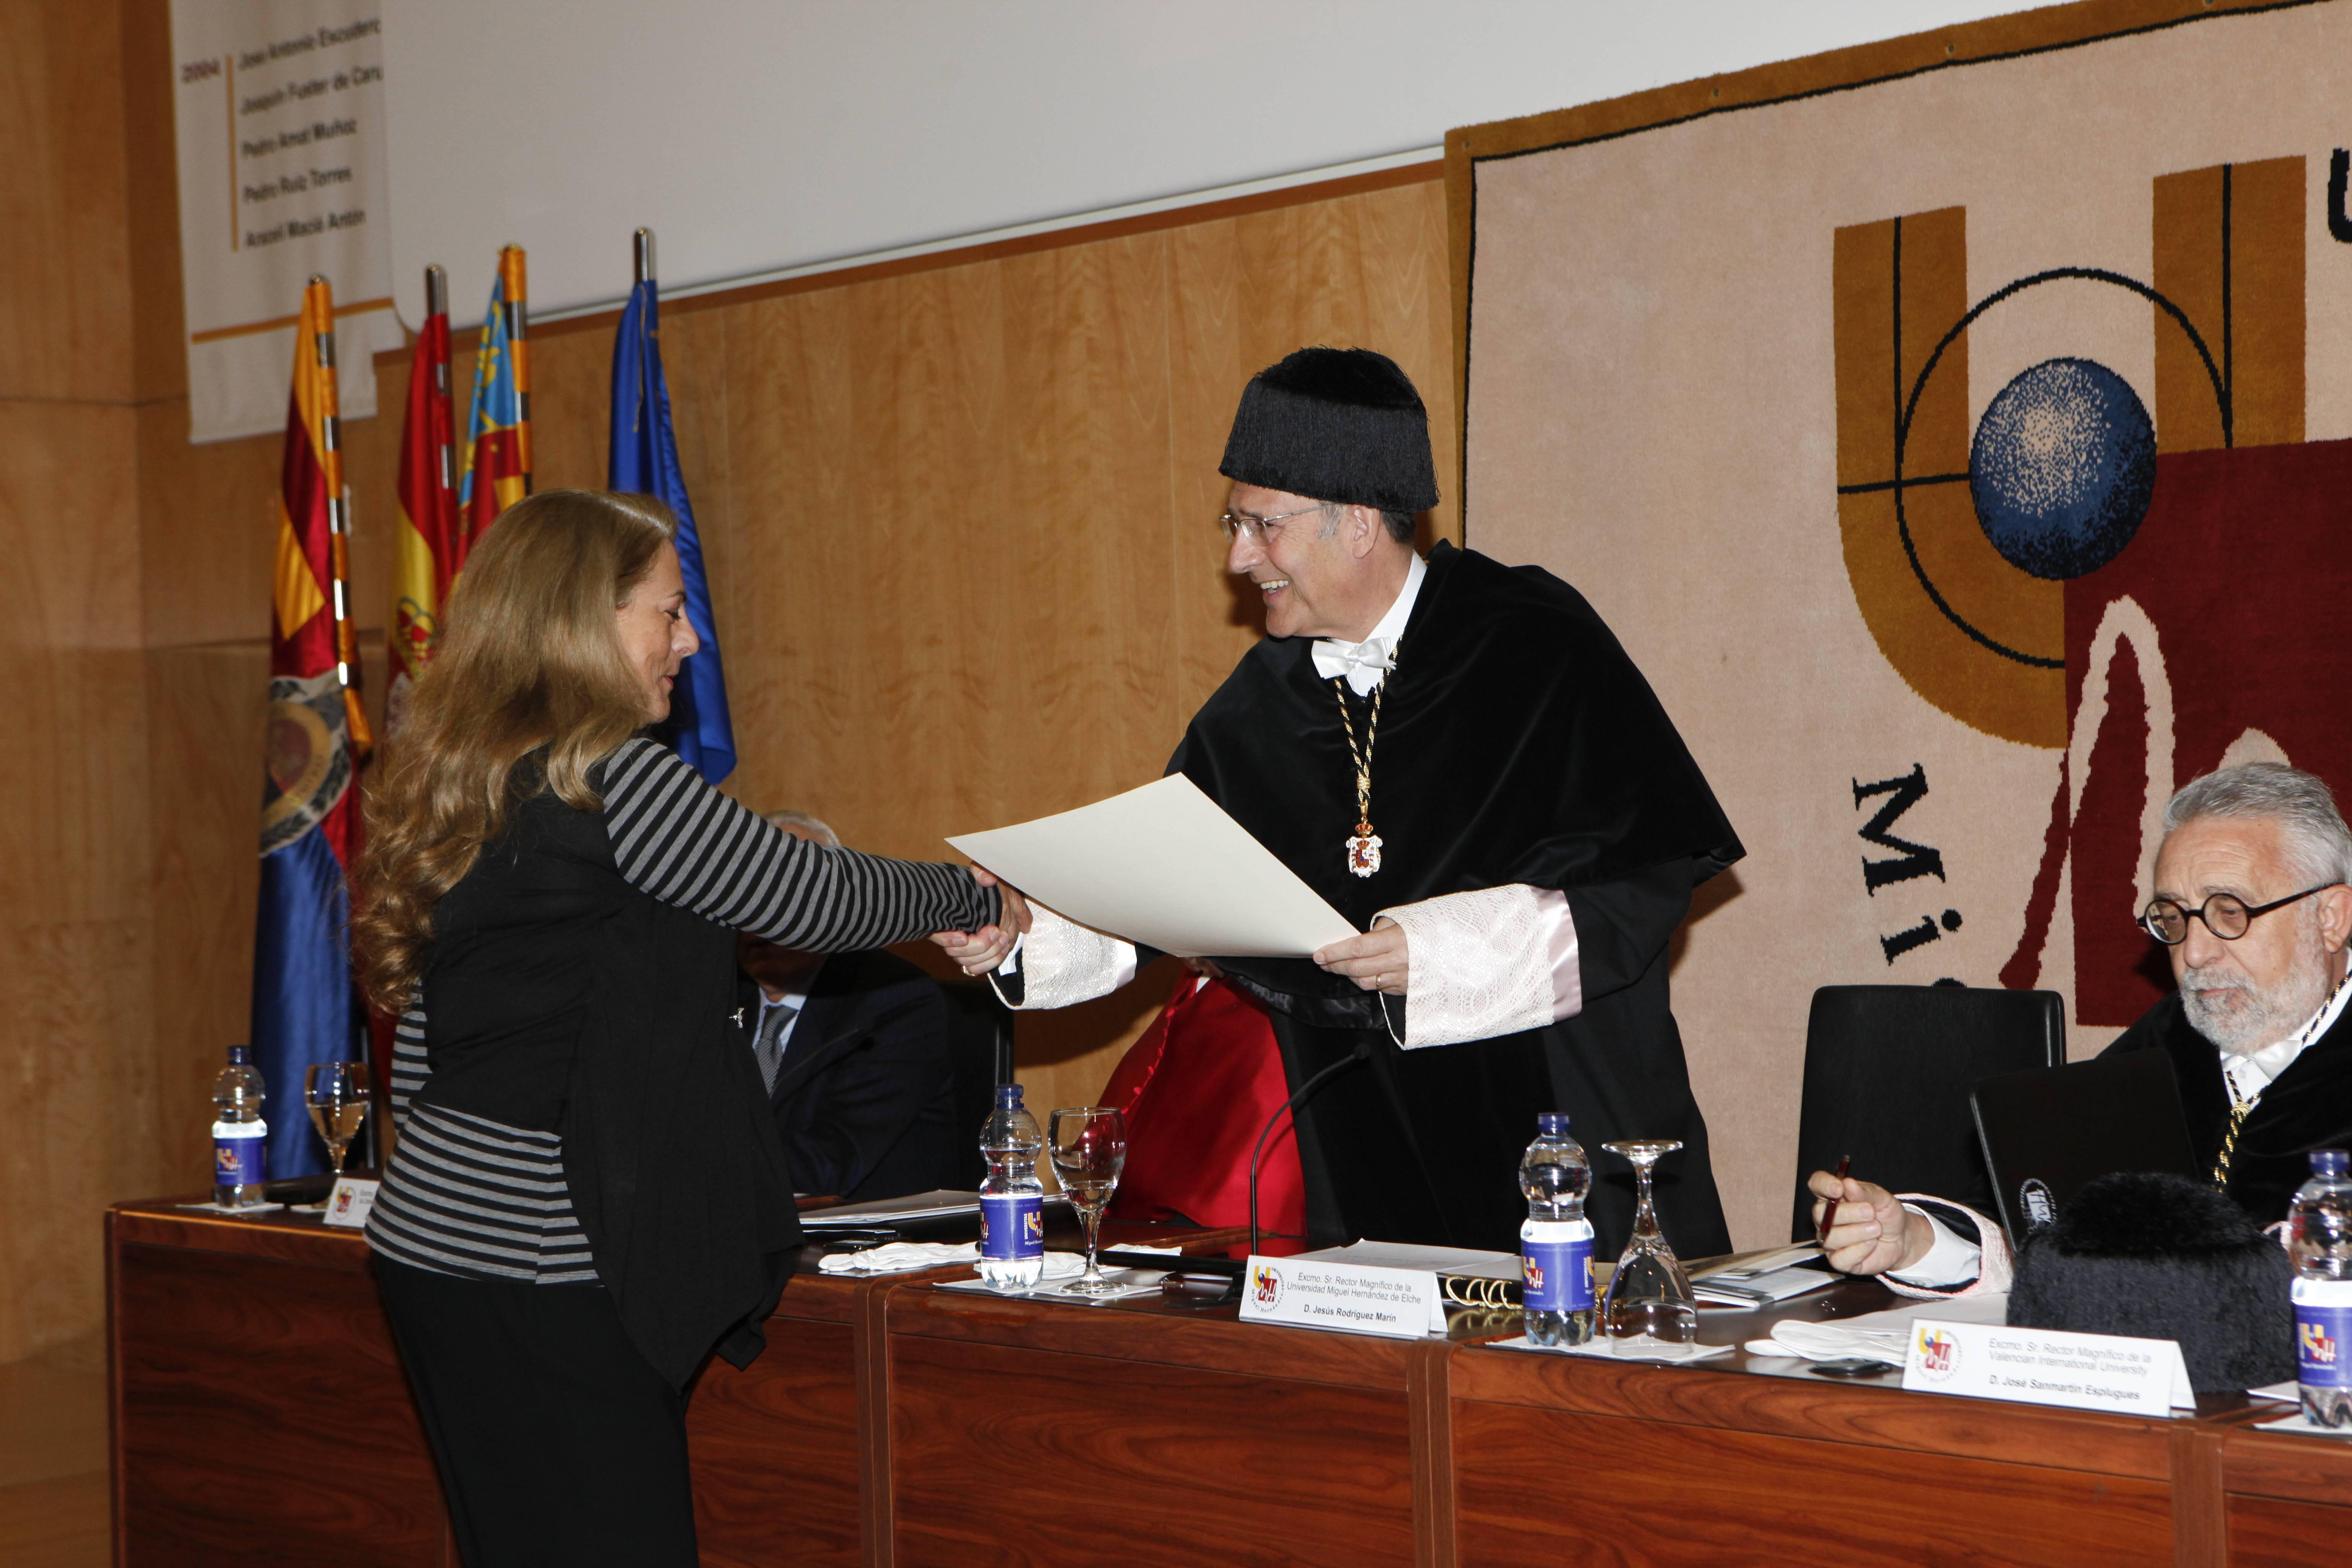 doctor-honoris-causa-luis-gamir_mg_1061.jpg